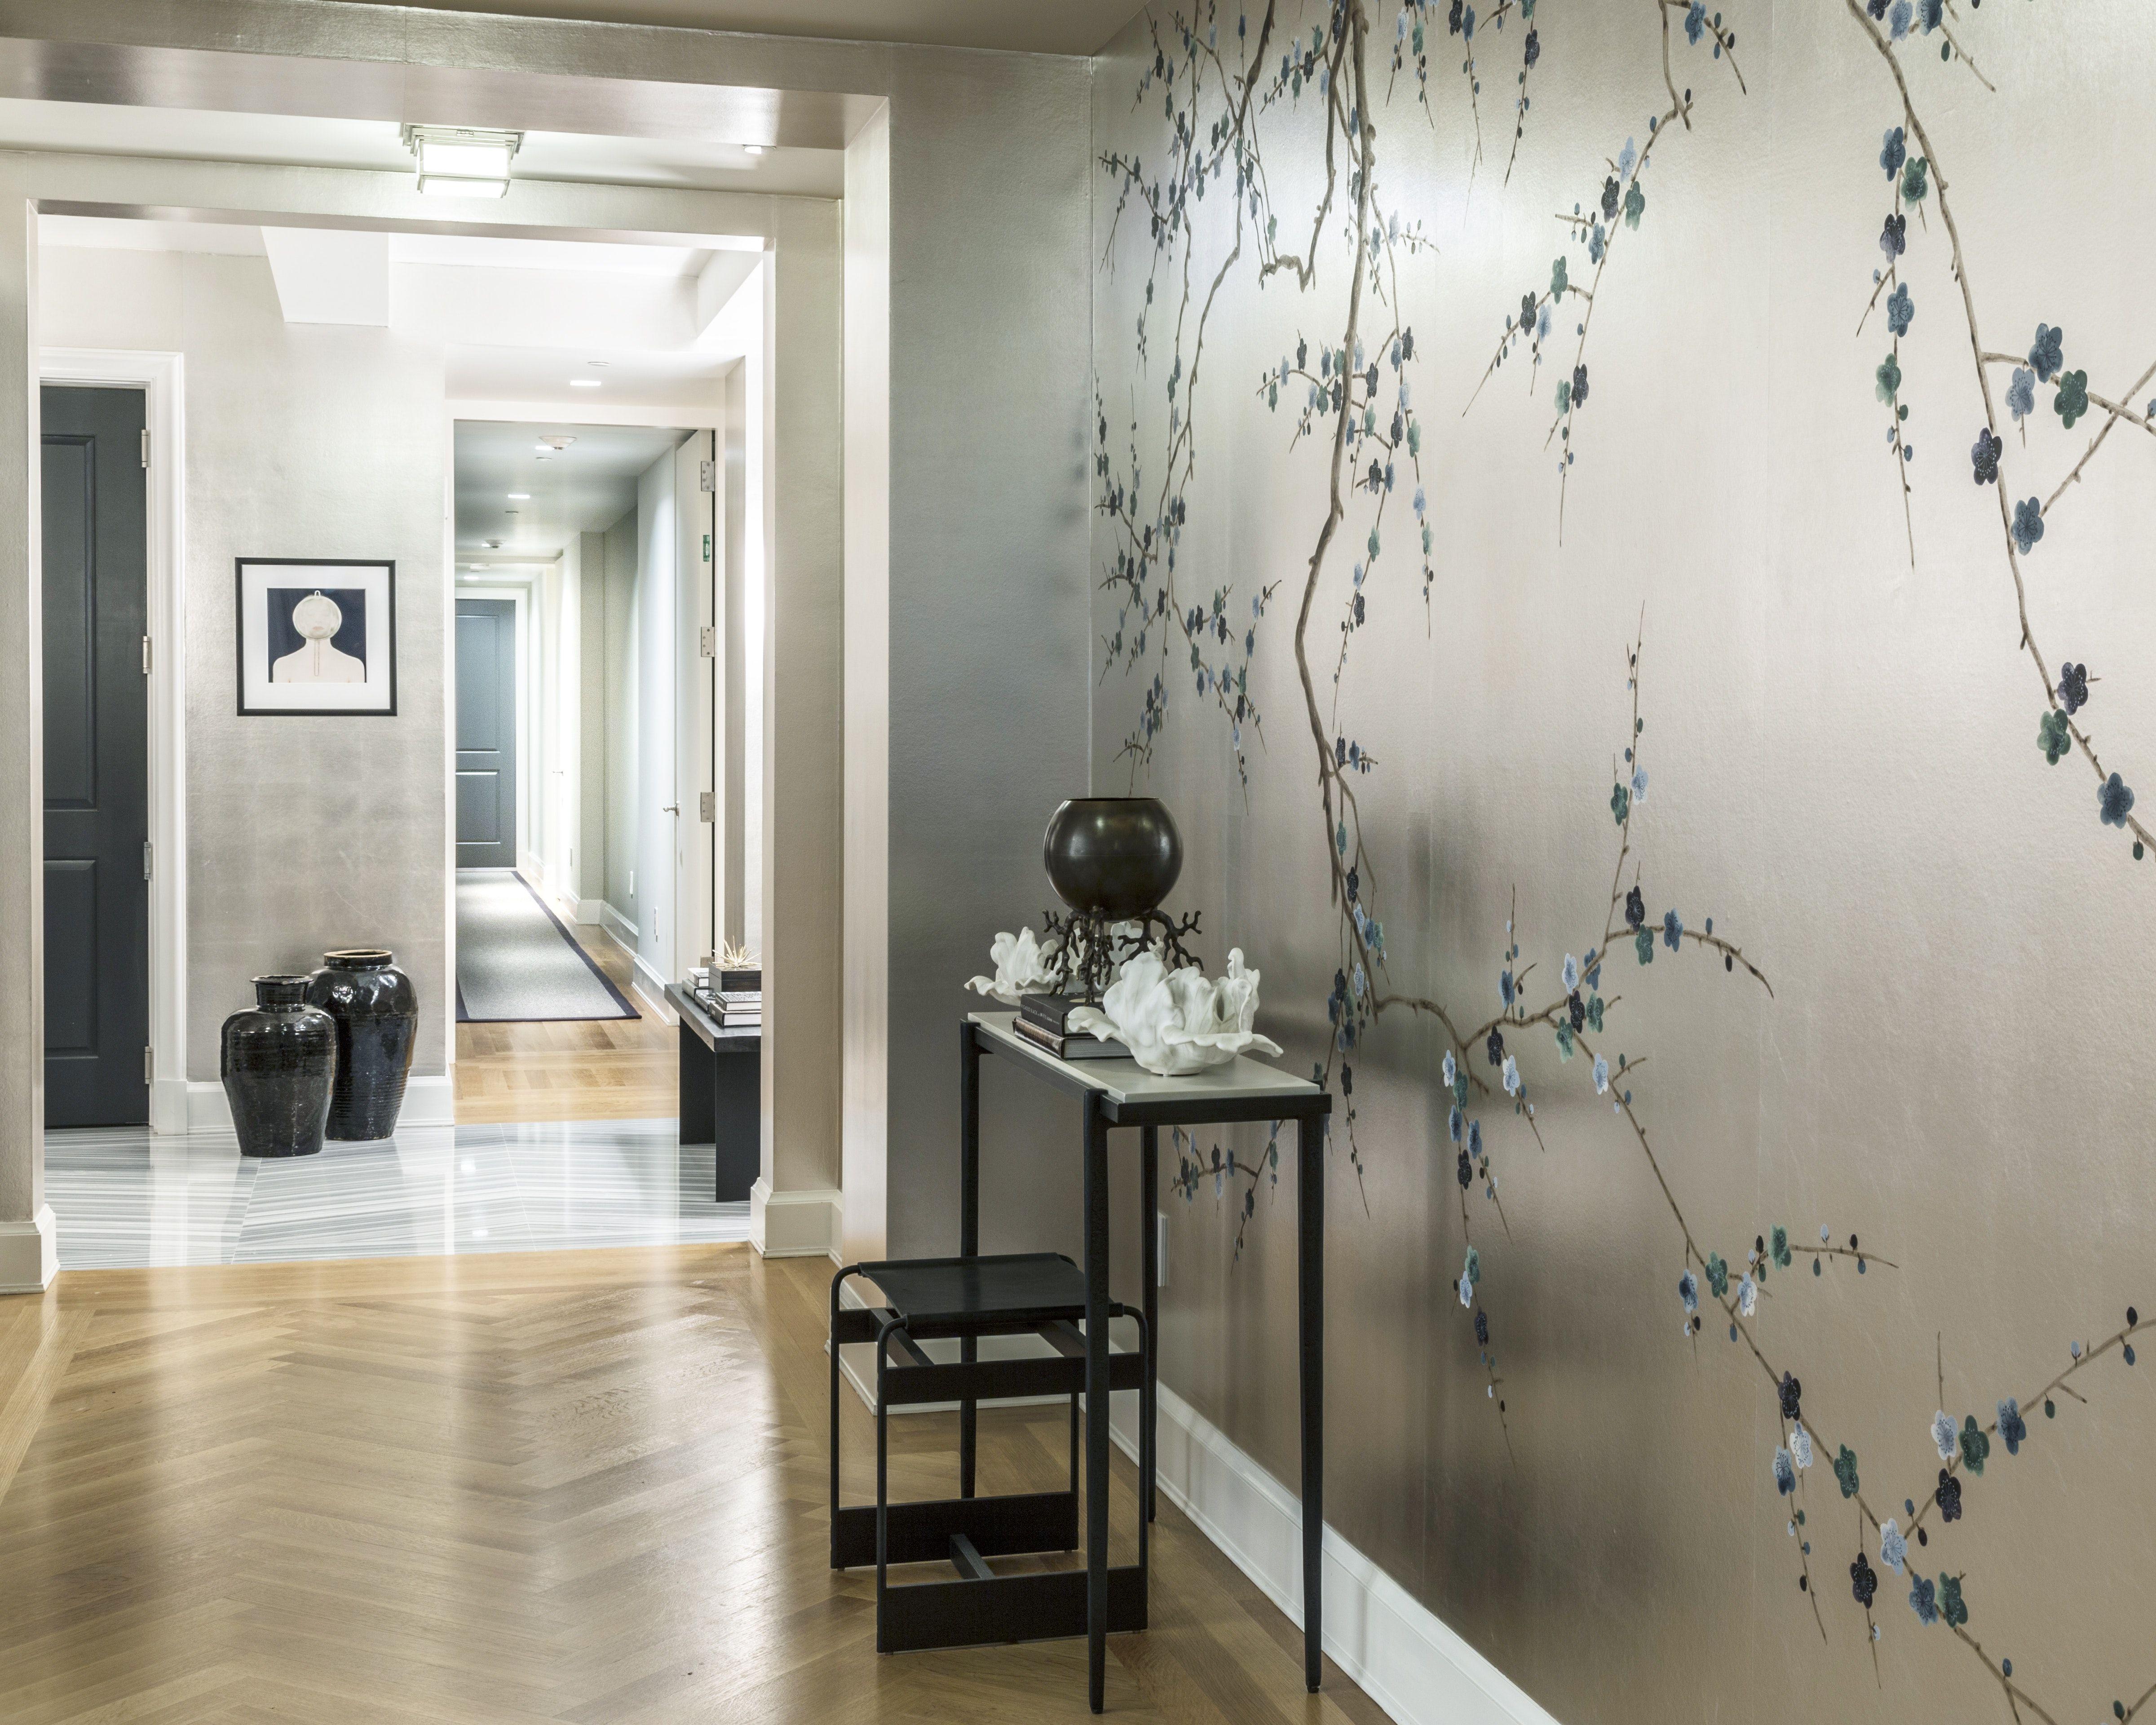 Contemporary hallway ideas   Gramercy Park South  rd Floor  Foyer  Nice rooms  Pinterest